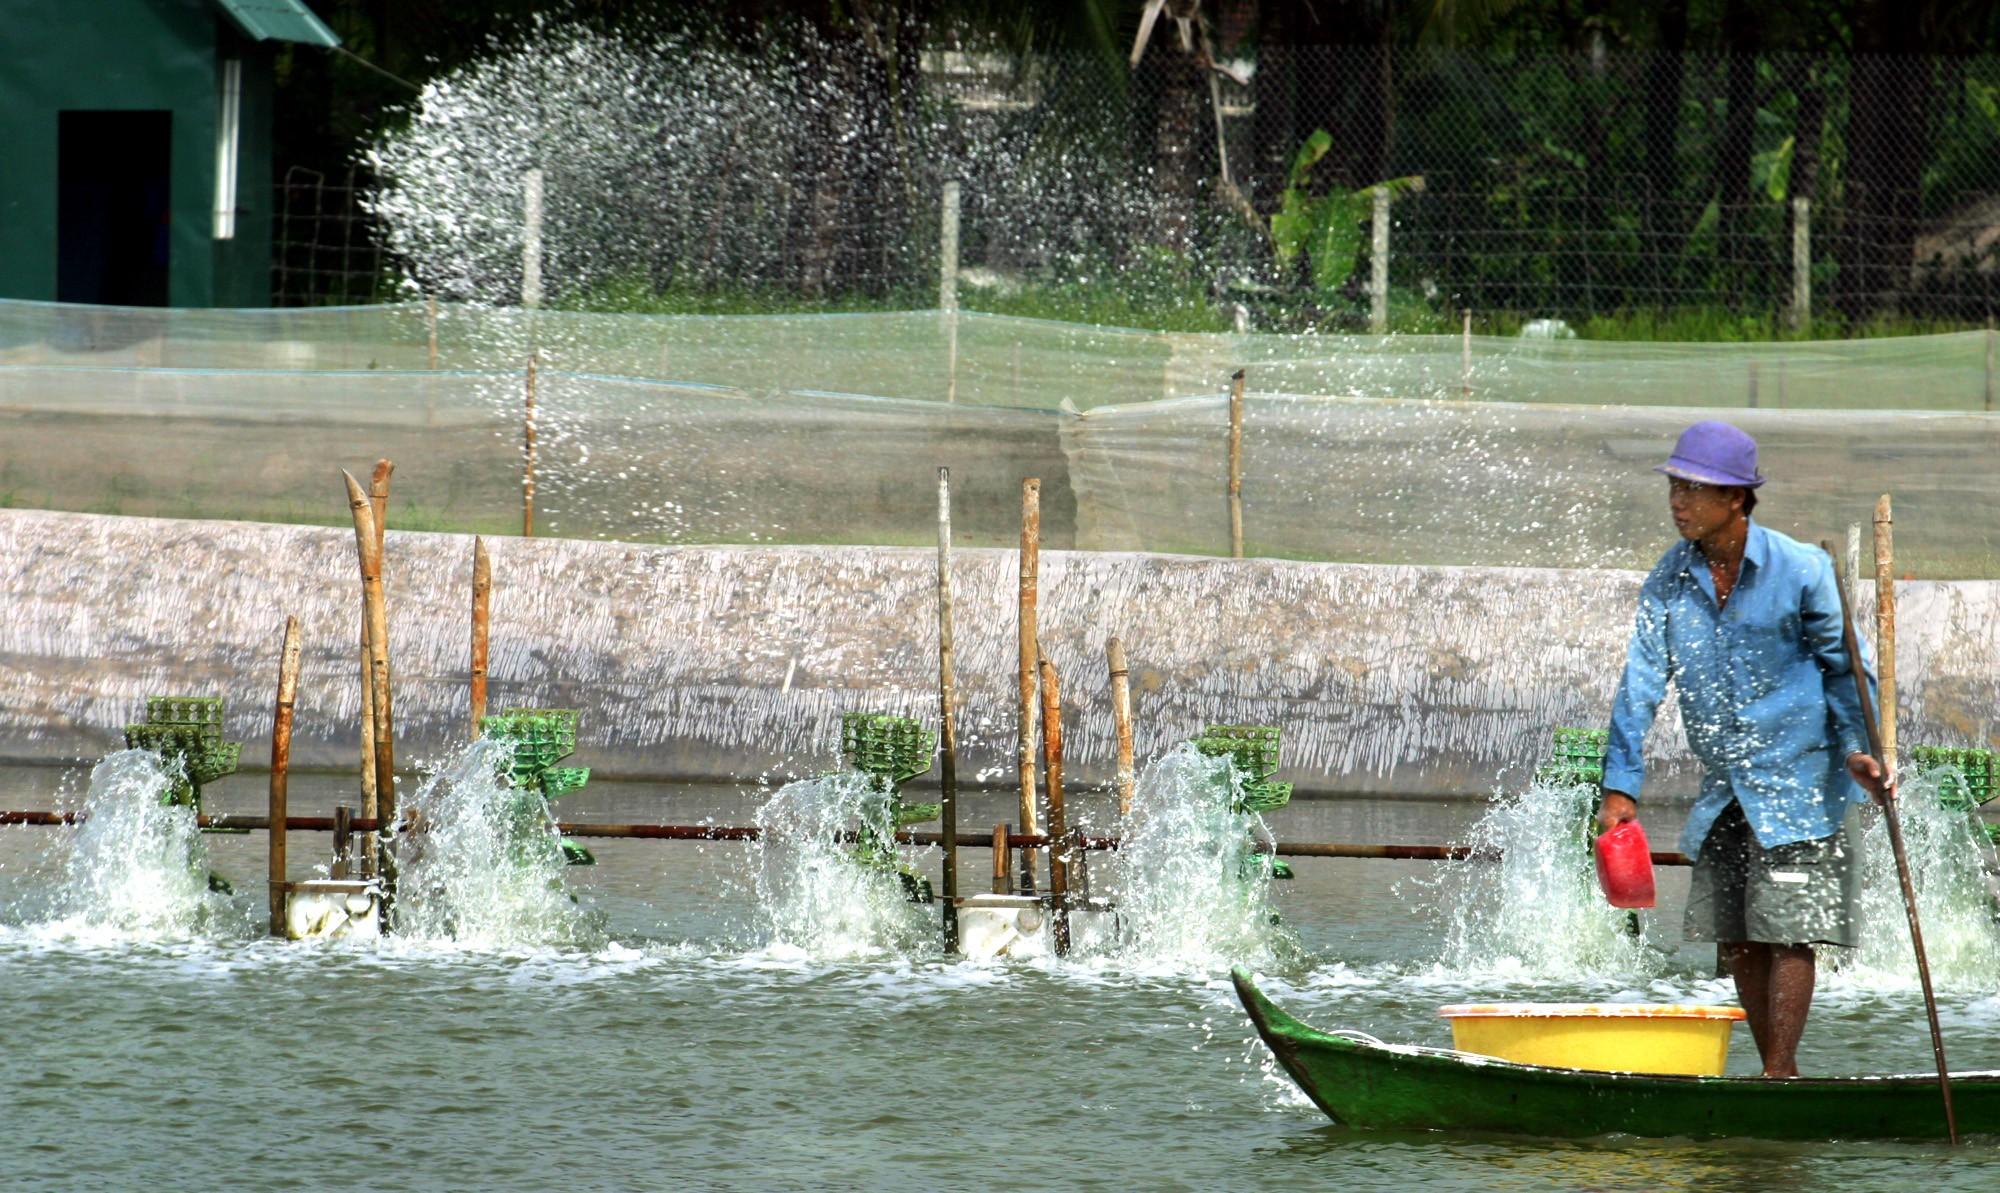 Shrimp pond in Vietnam